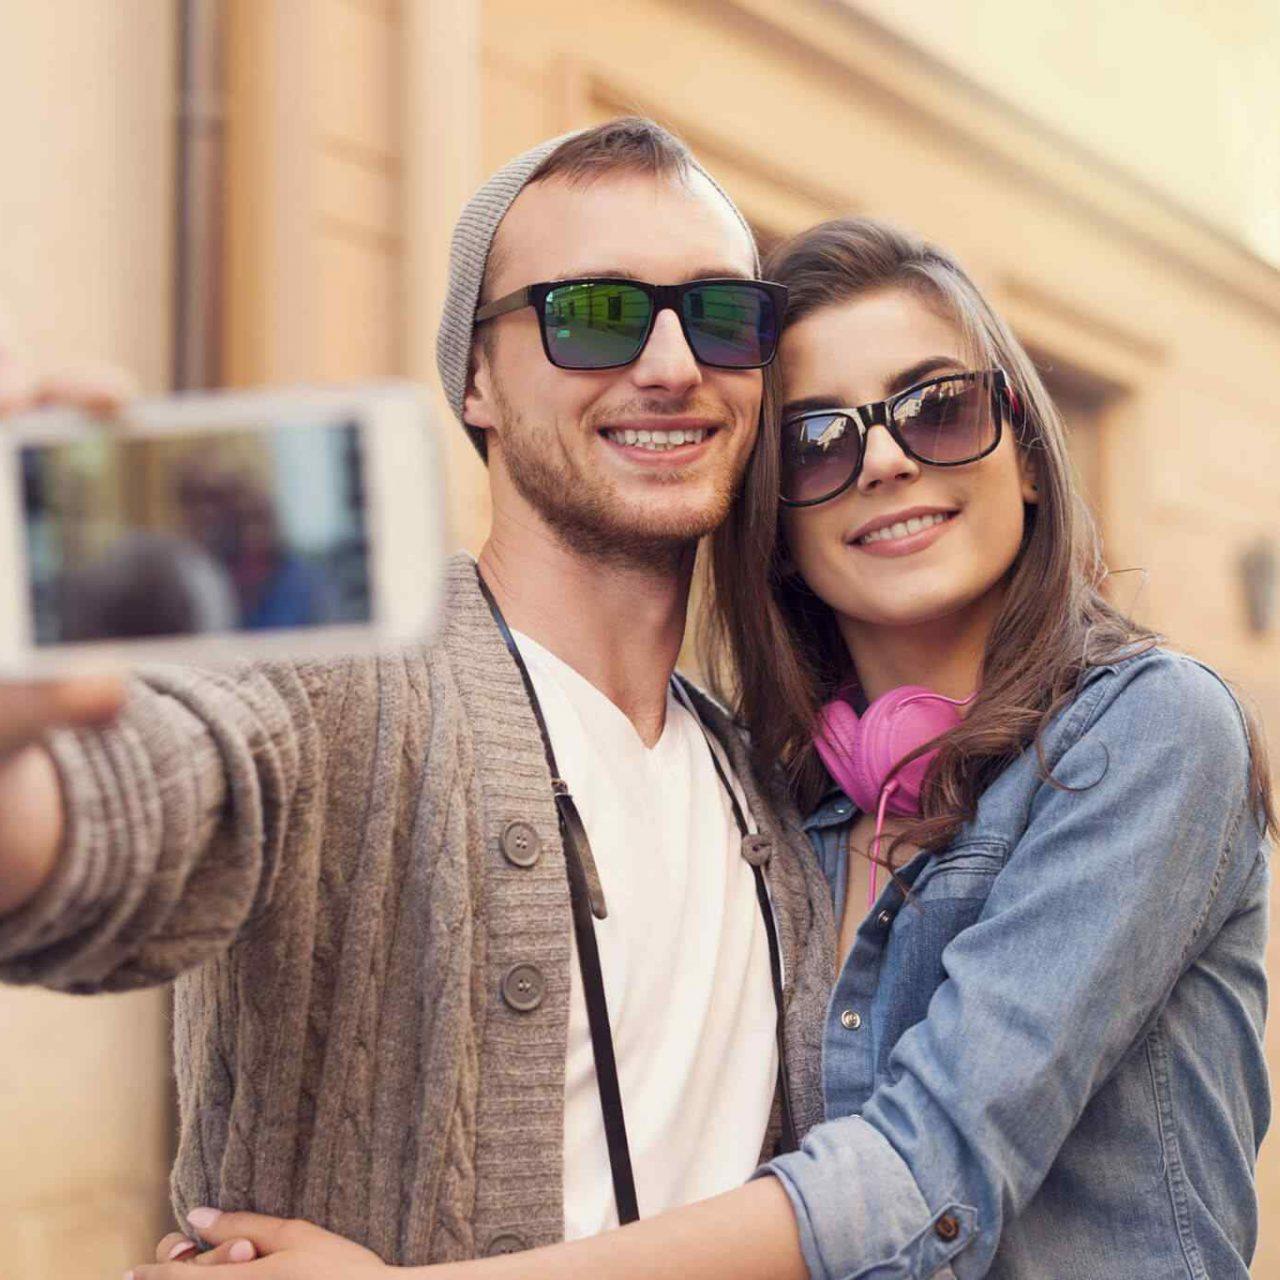 https://www.prepared.sarl/wp-content/uploads/2018/01/img-event-marriage-02-1280x1280.jpg